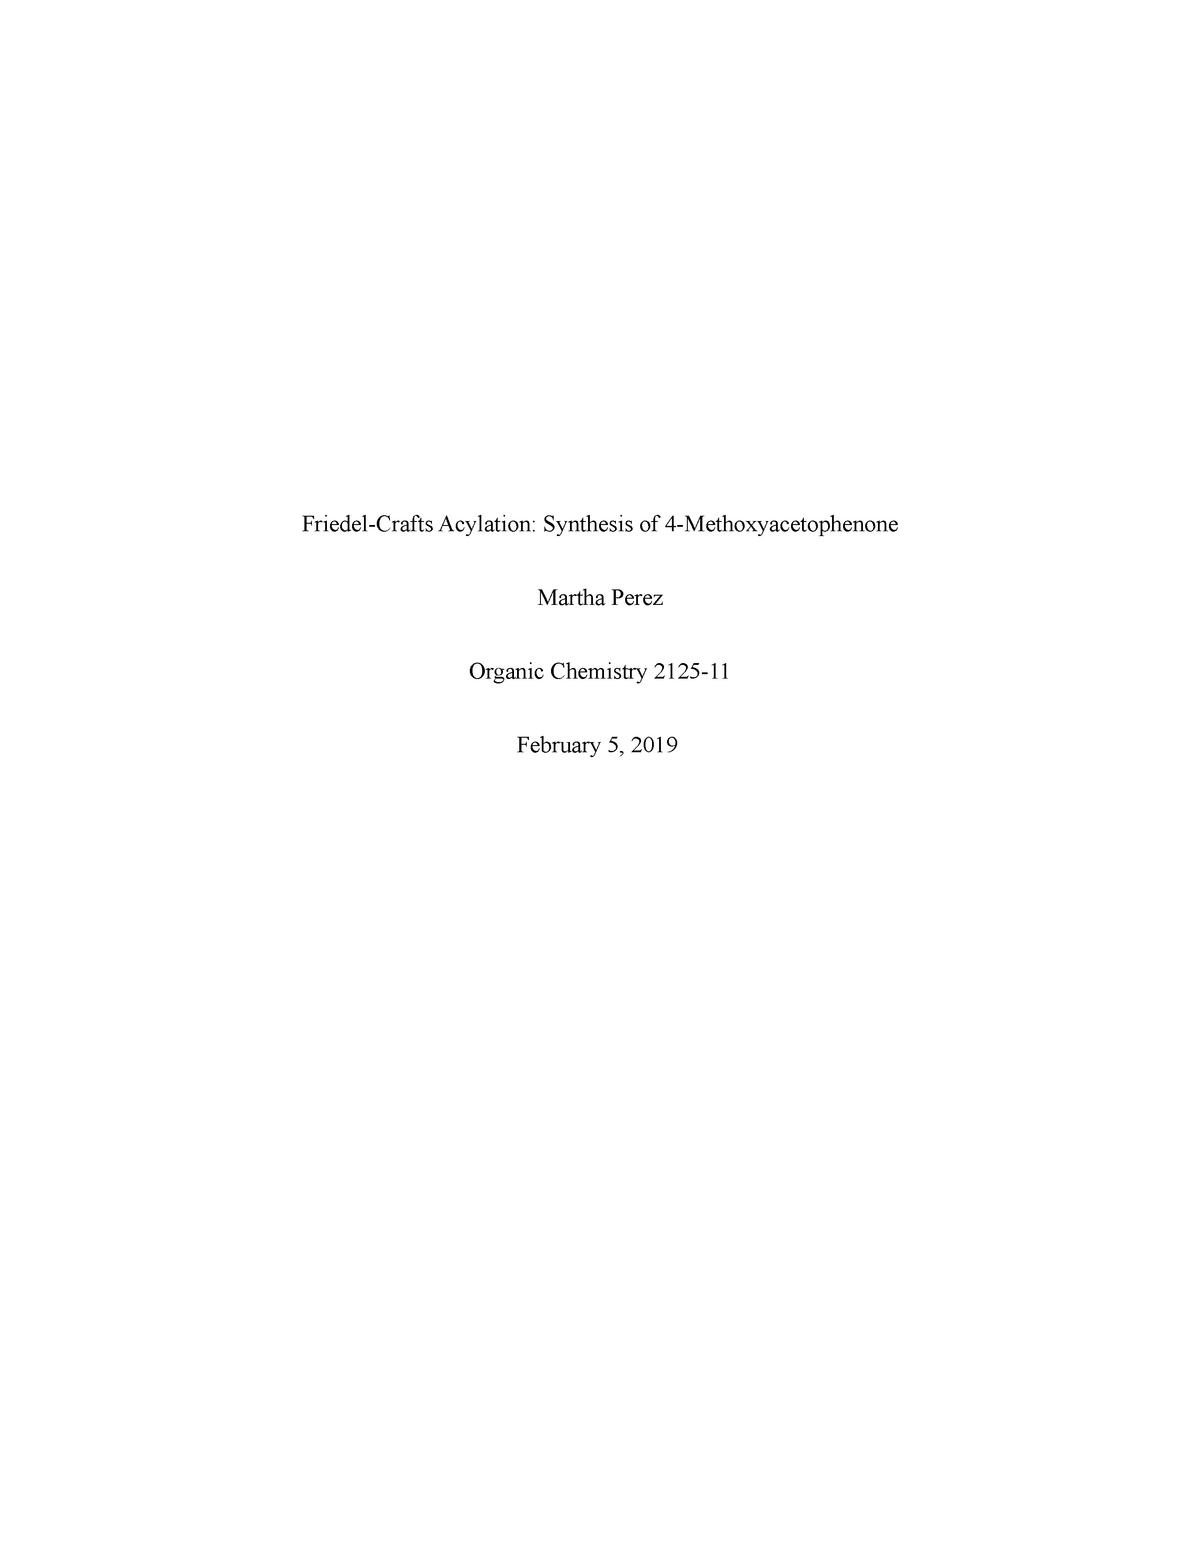 Friedel-Crafts Lab report 1 martha perez - CHEM4325: Chemistry